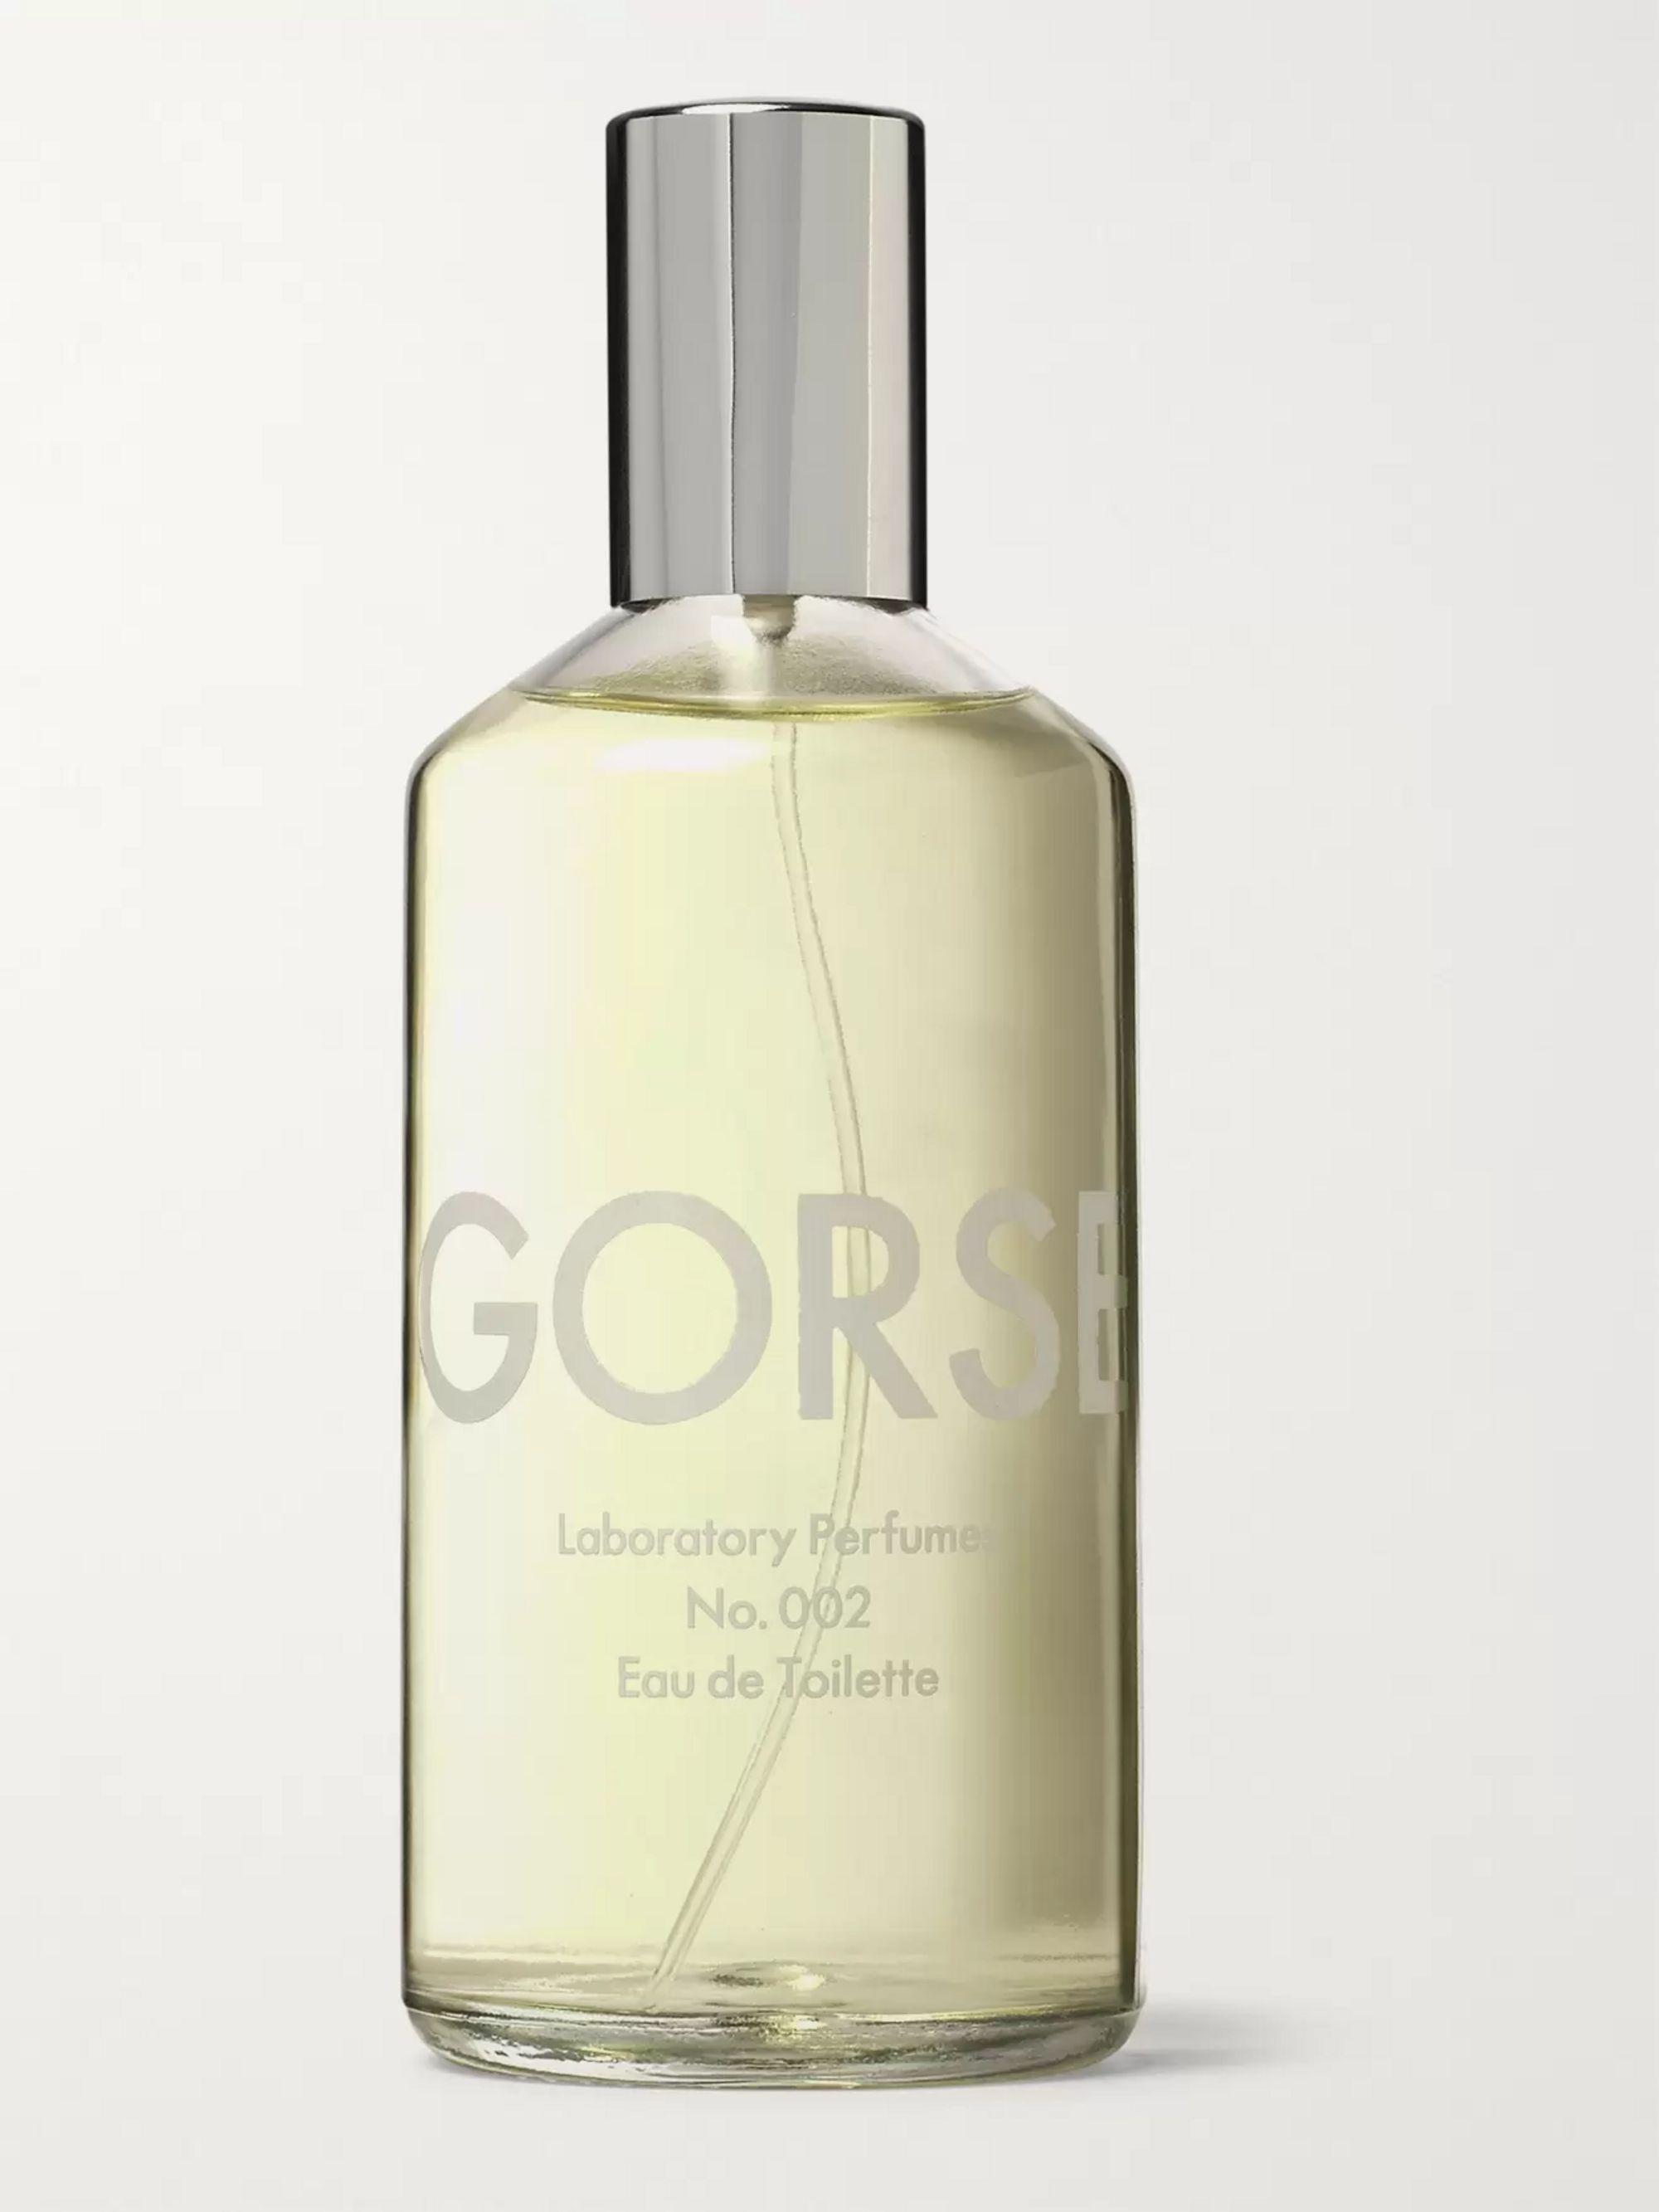 Laboratory Perfumes No. 002 Gorse Eau de Toilette, 100ml